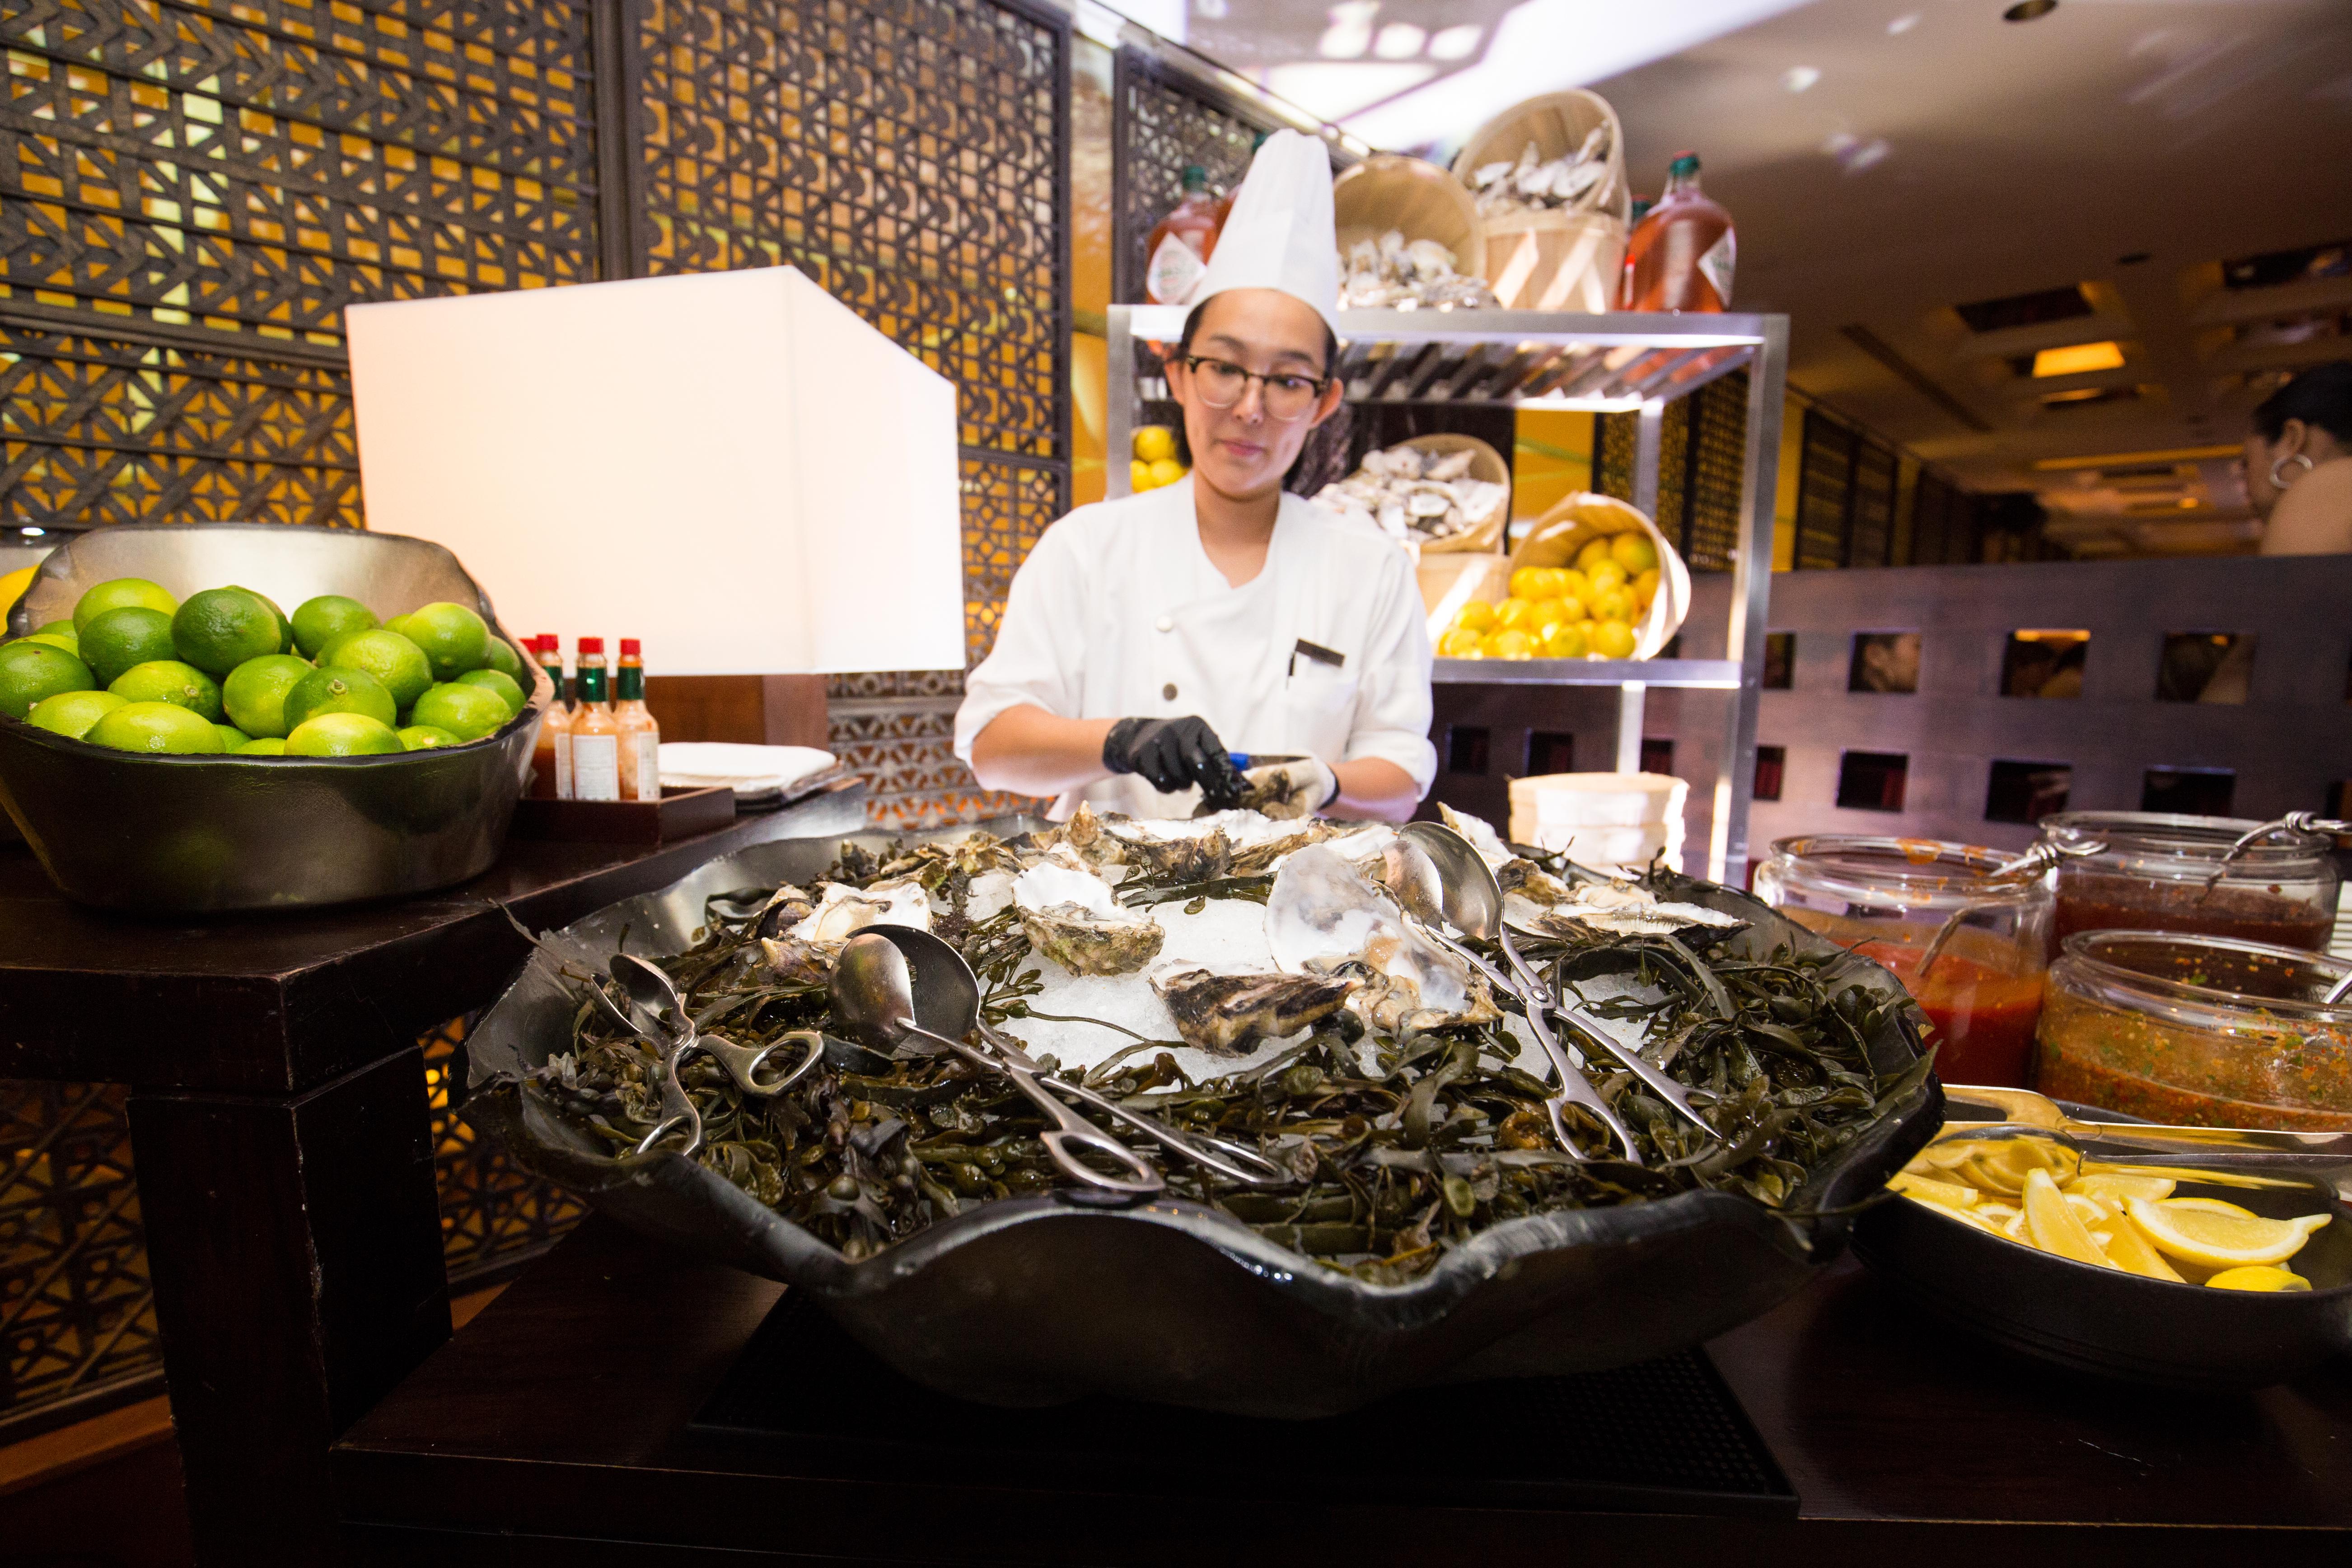 Singapore food photographer strobist